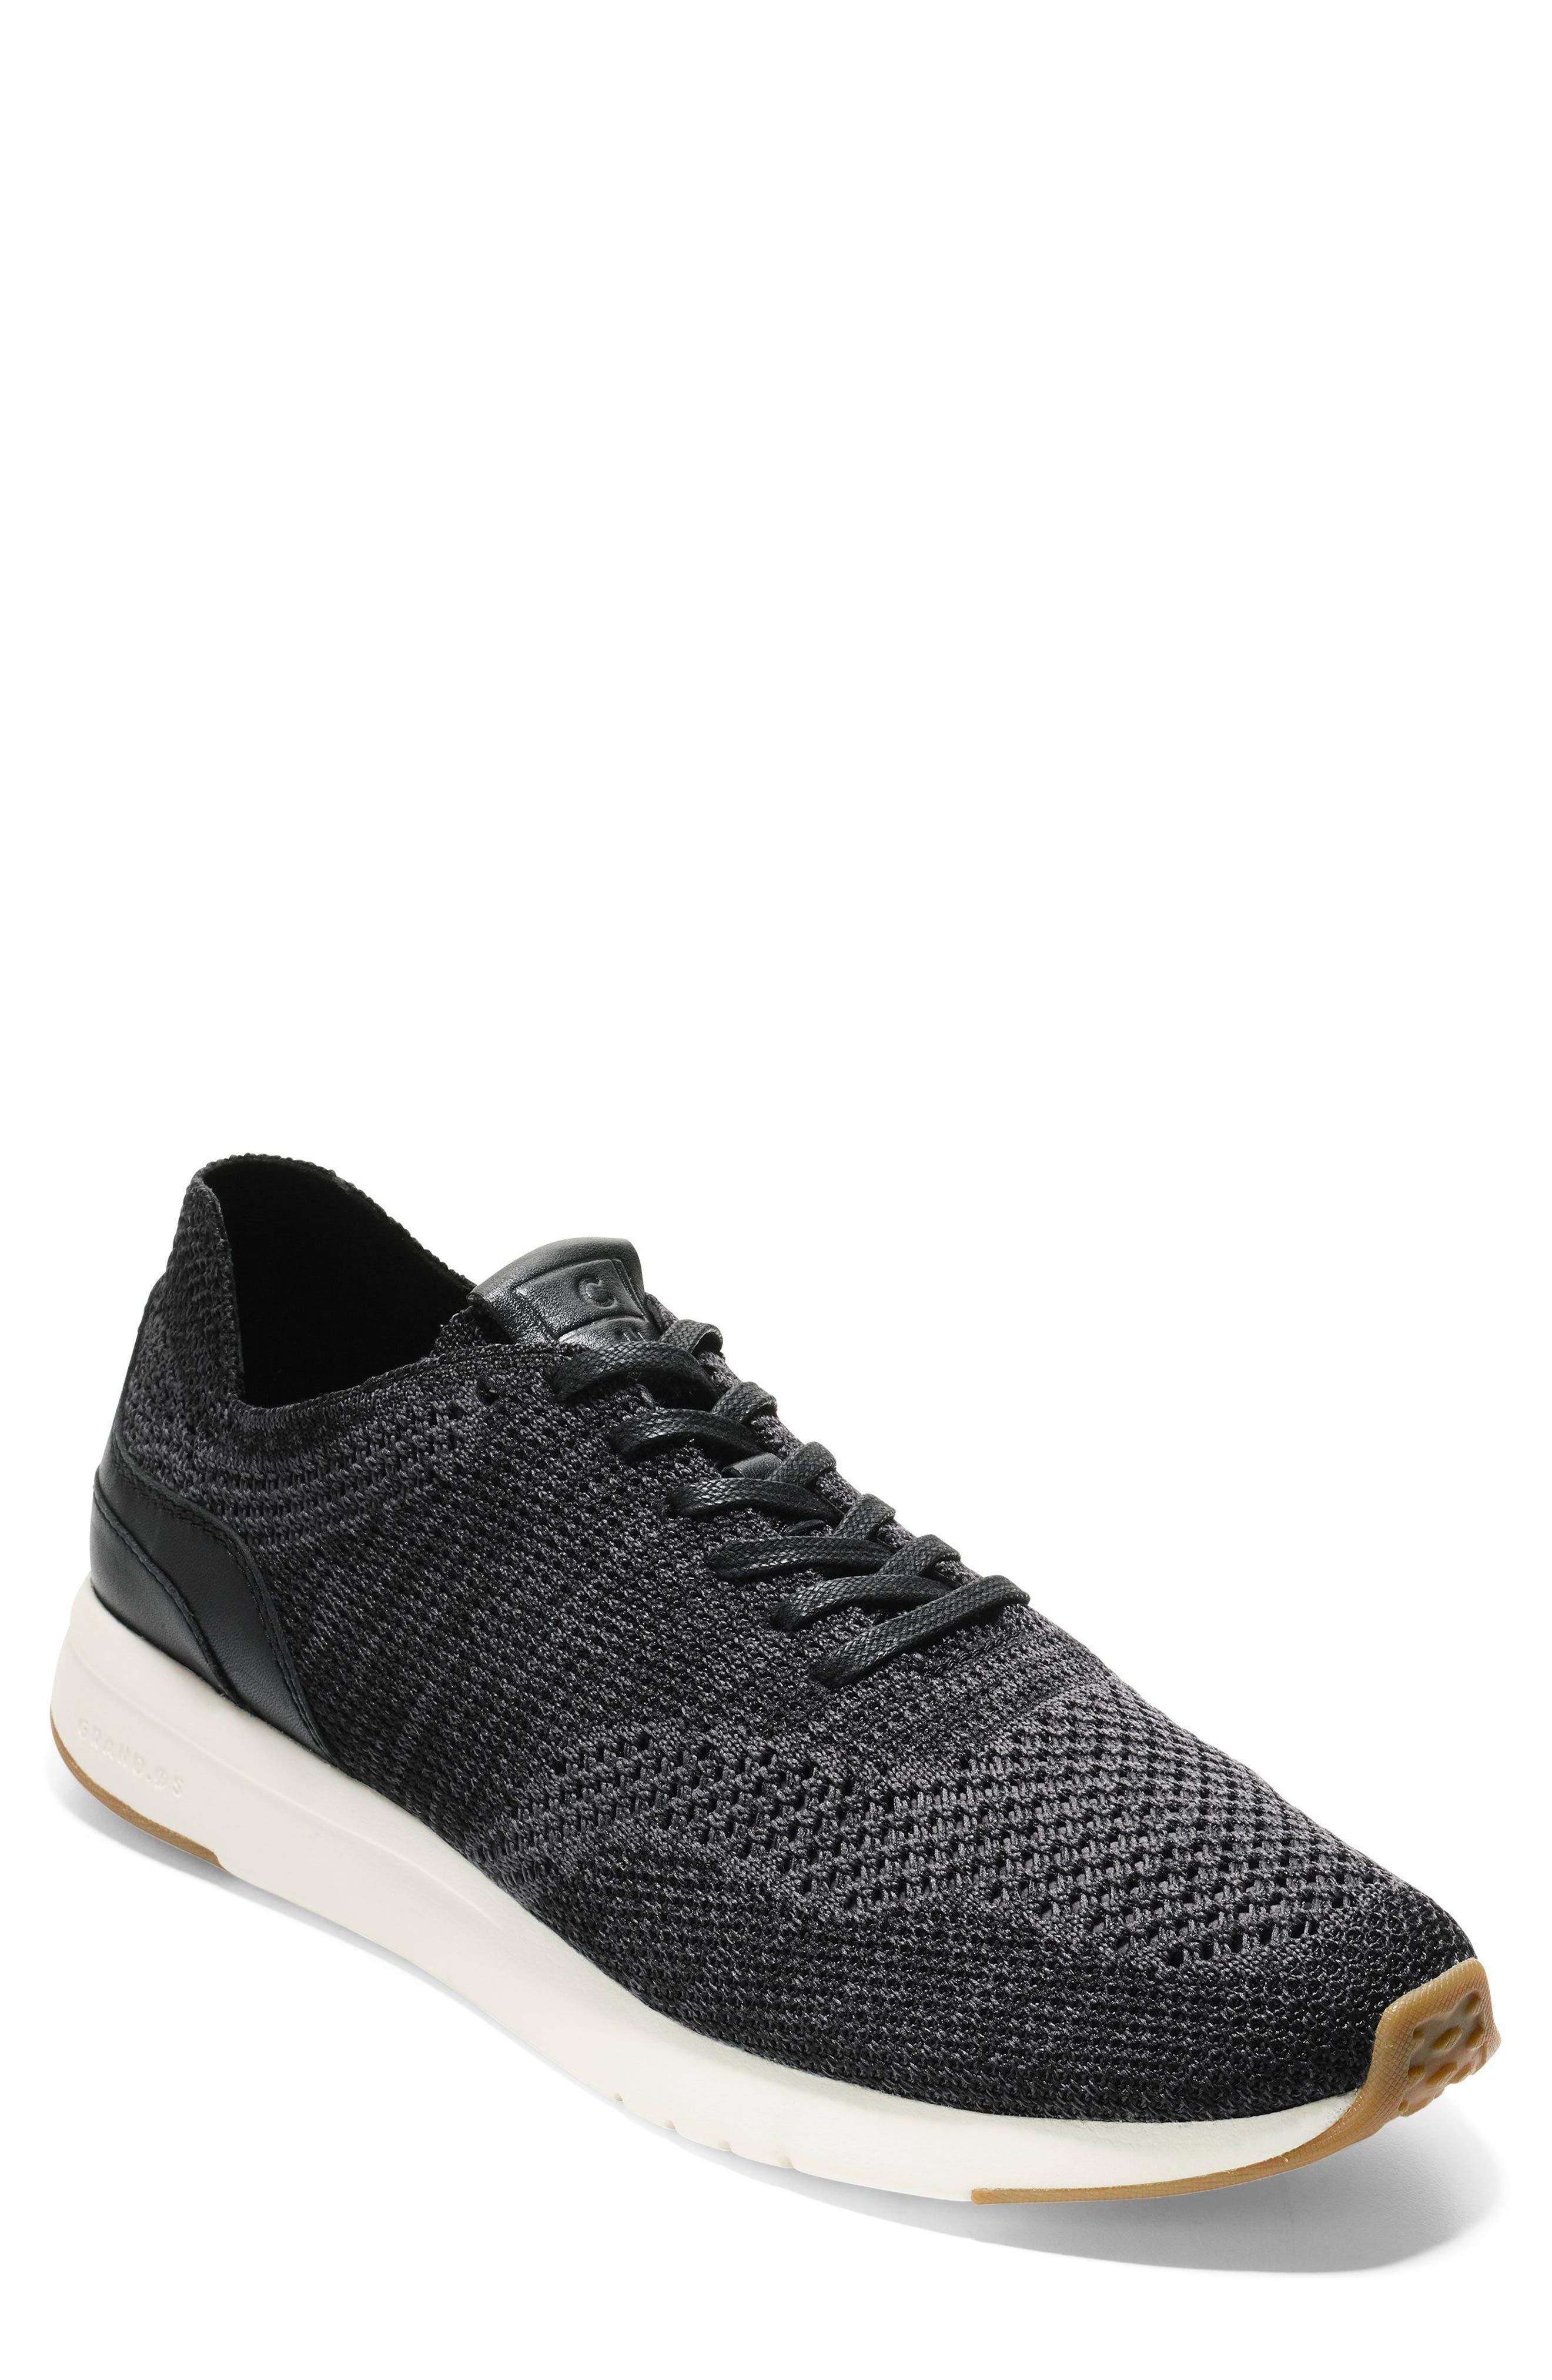 GrandPro Runner Stitchlite Sneaker, Main, color, 001